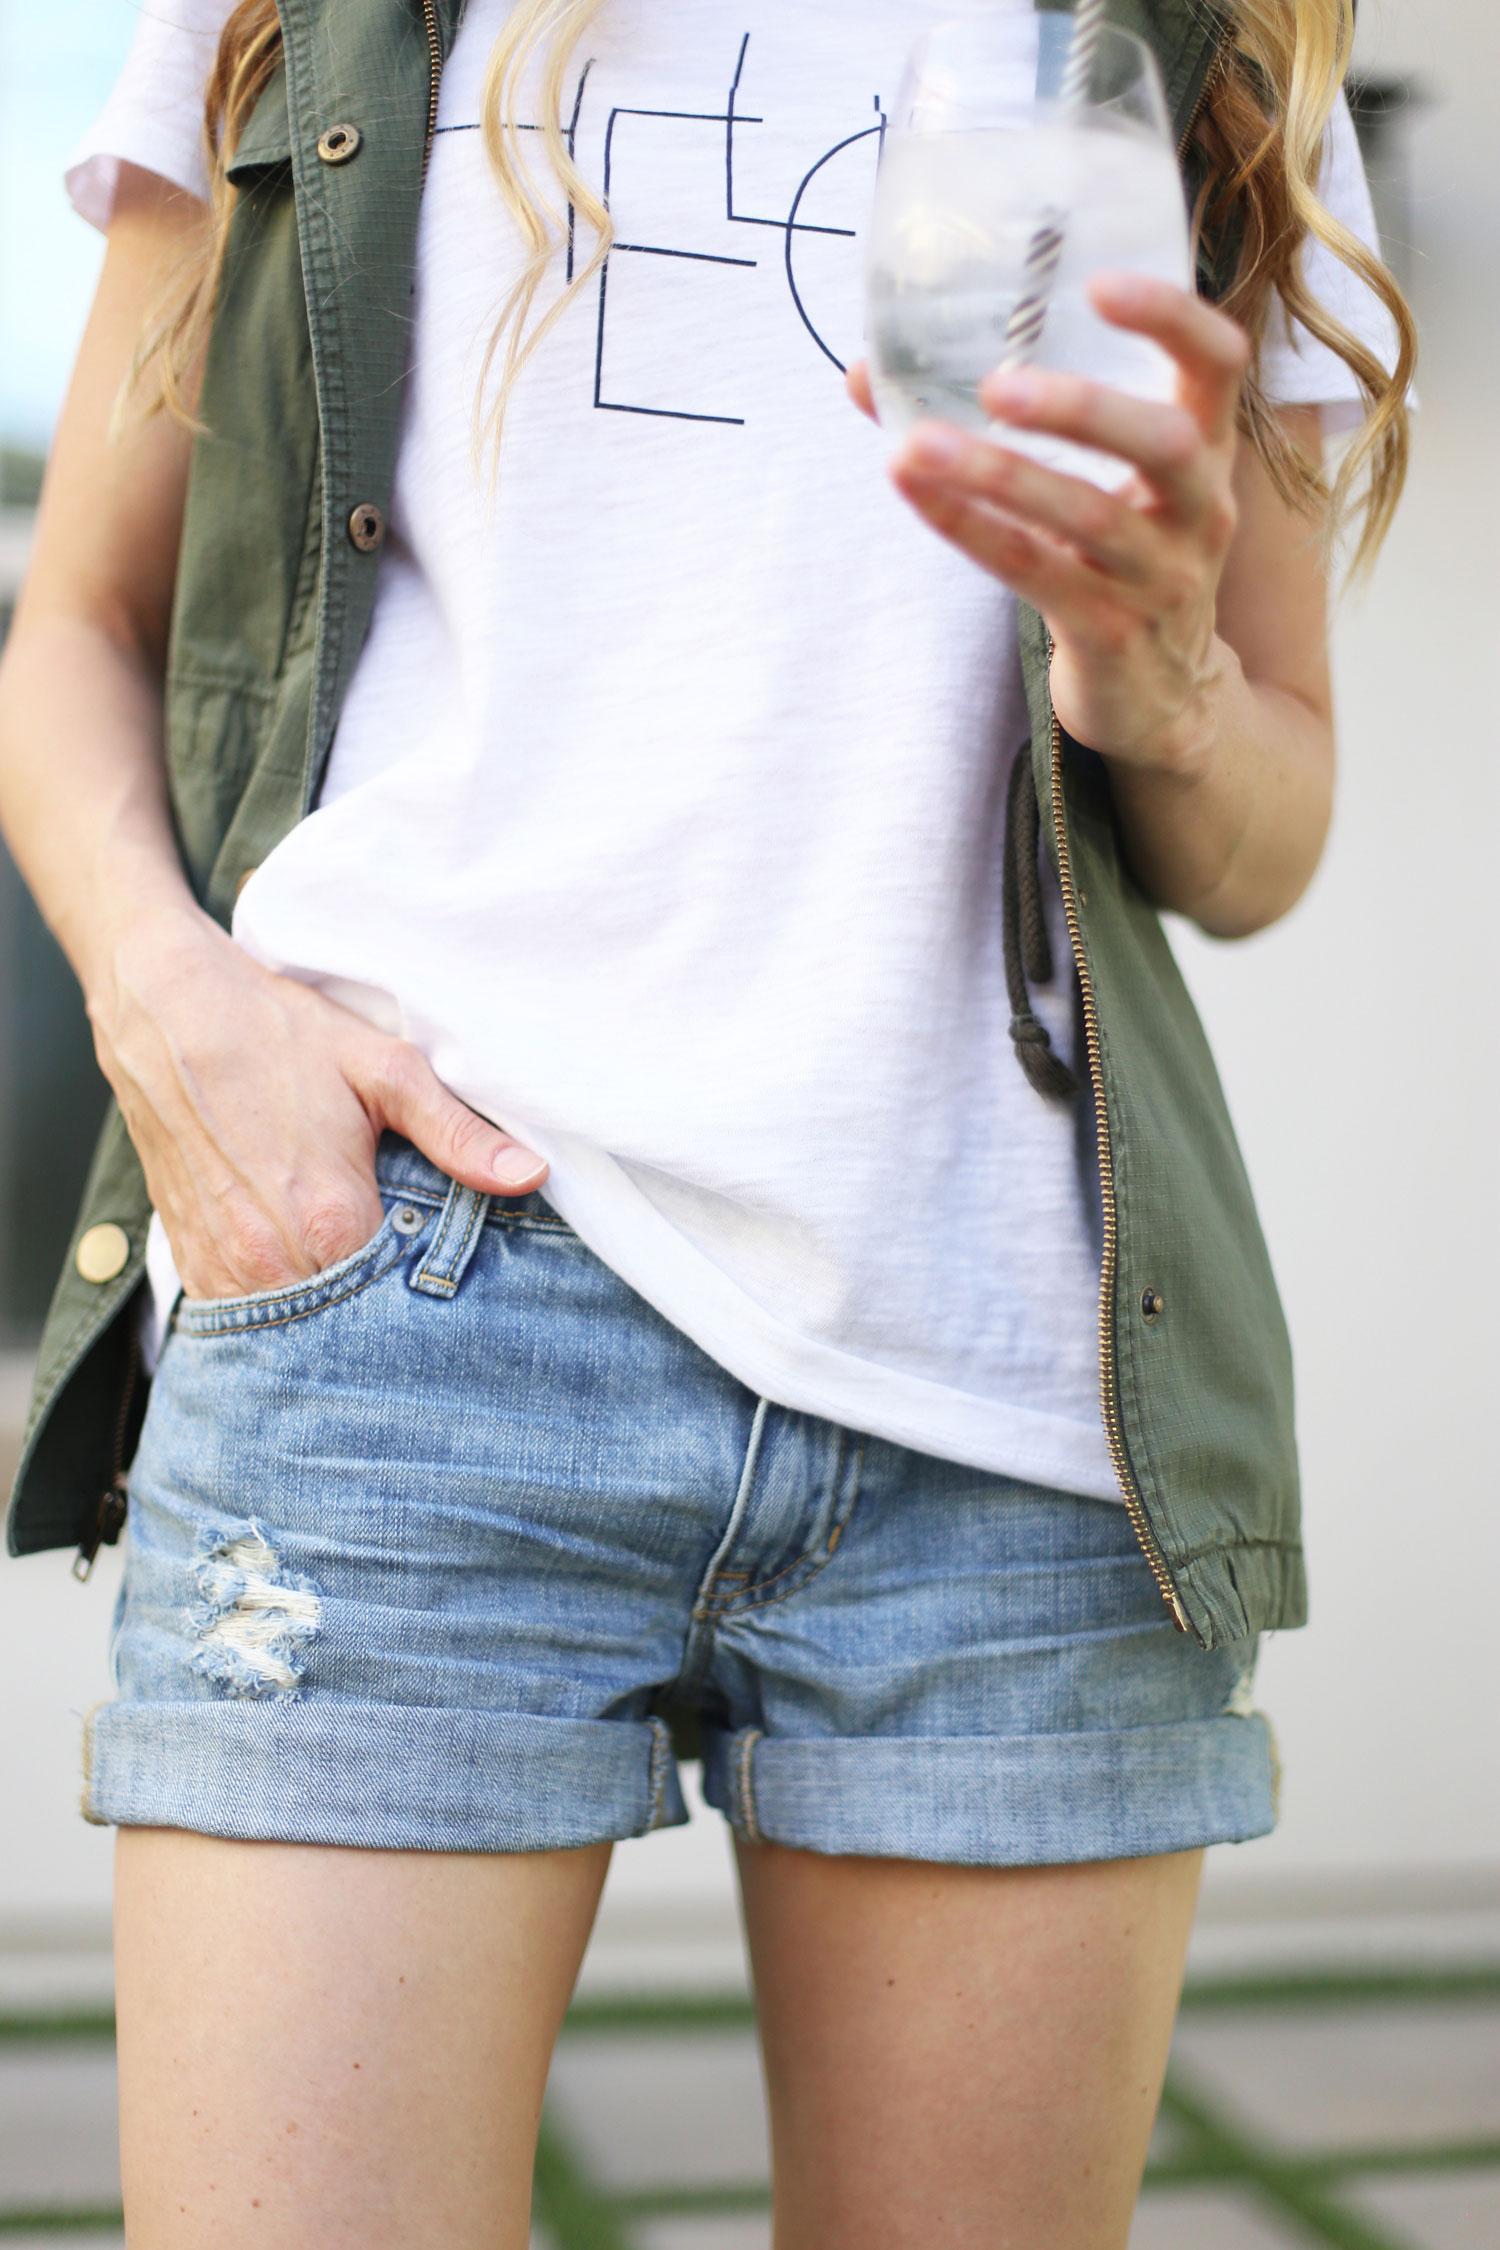 e3d31115f48 Boyfriend Shorts That Will Make You Actually Like Shorts